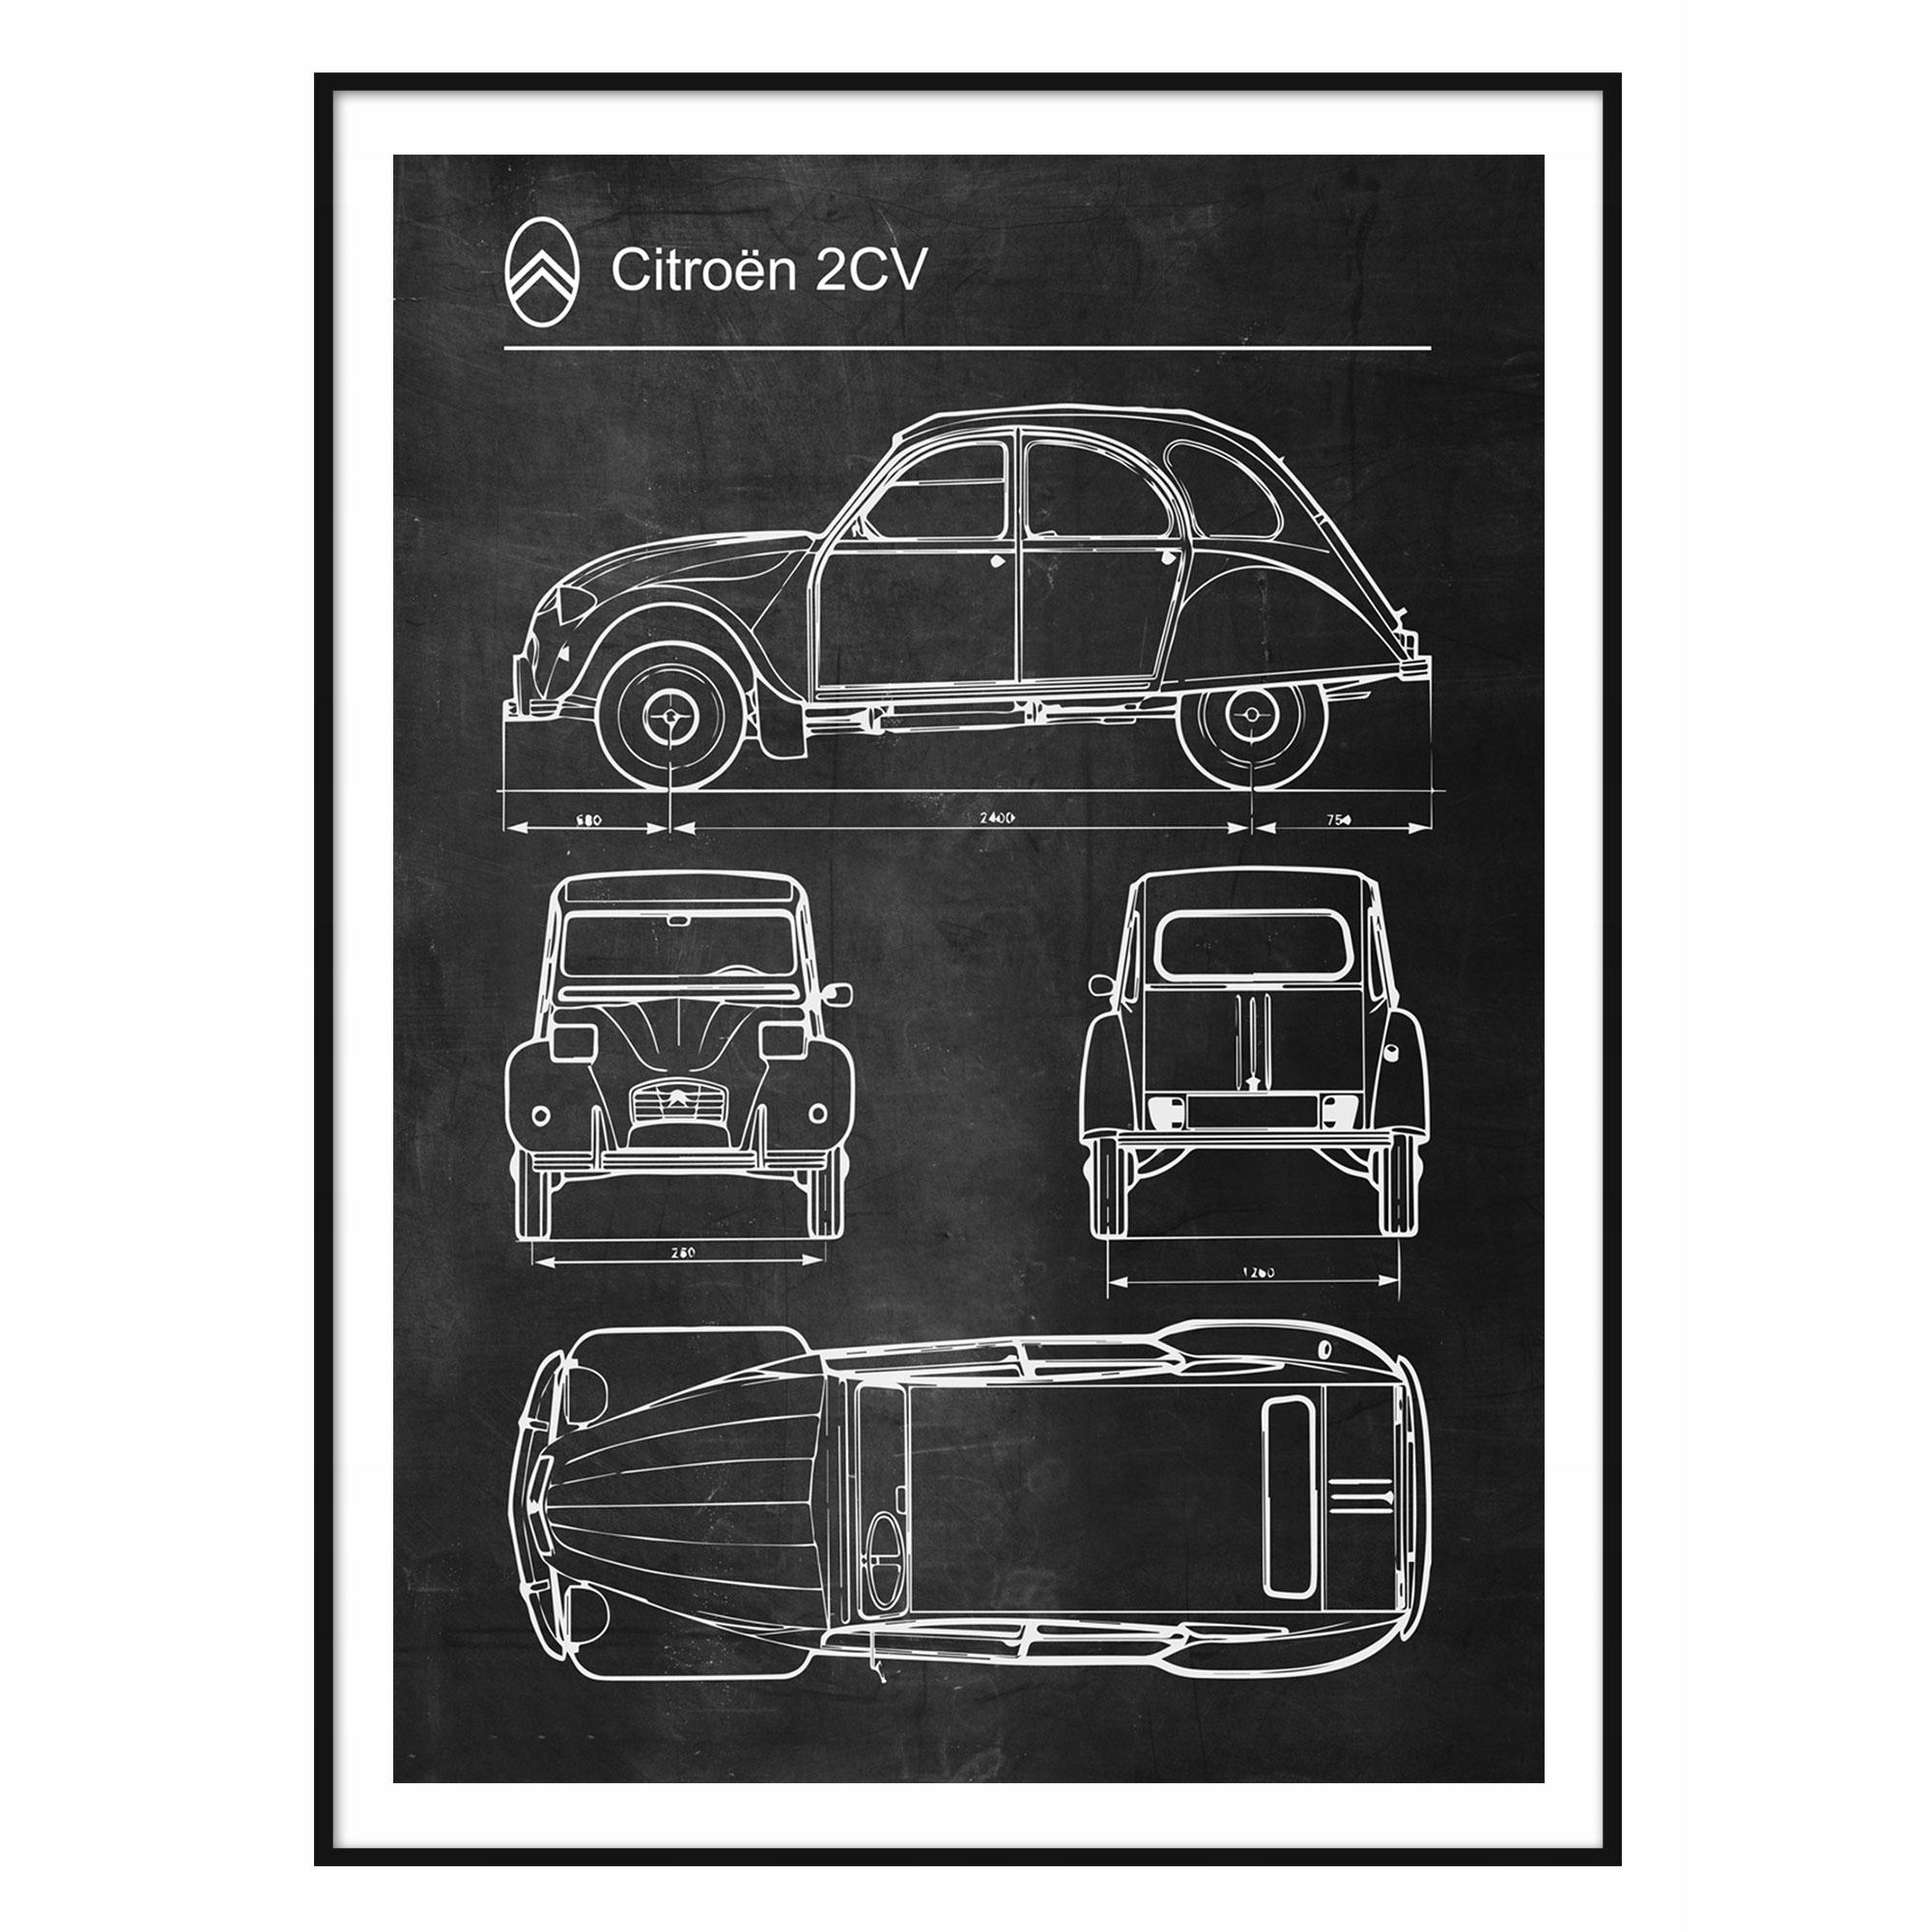 Citroen 2CV Retro patentový diagram